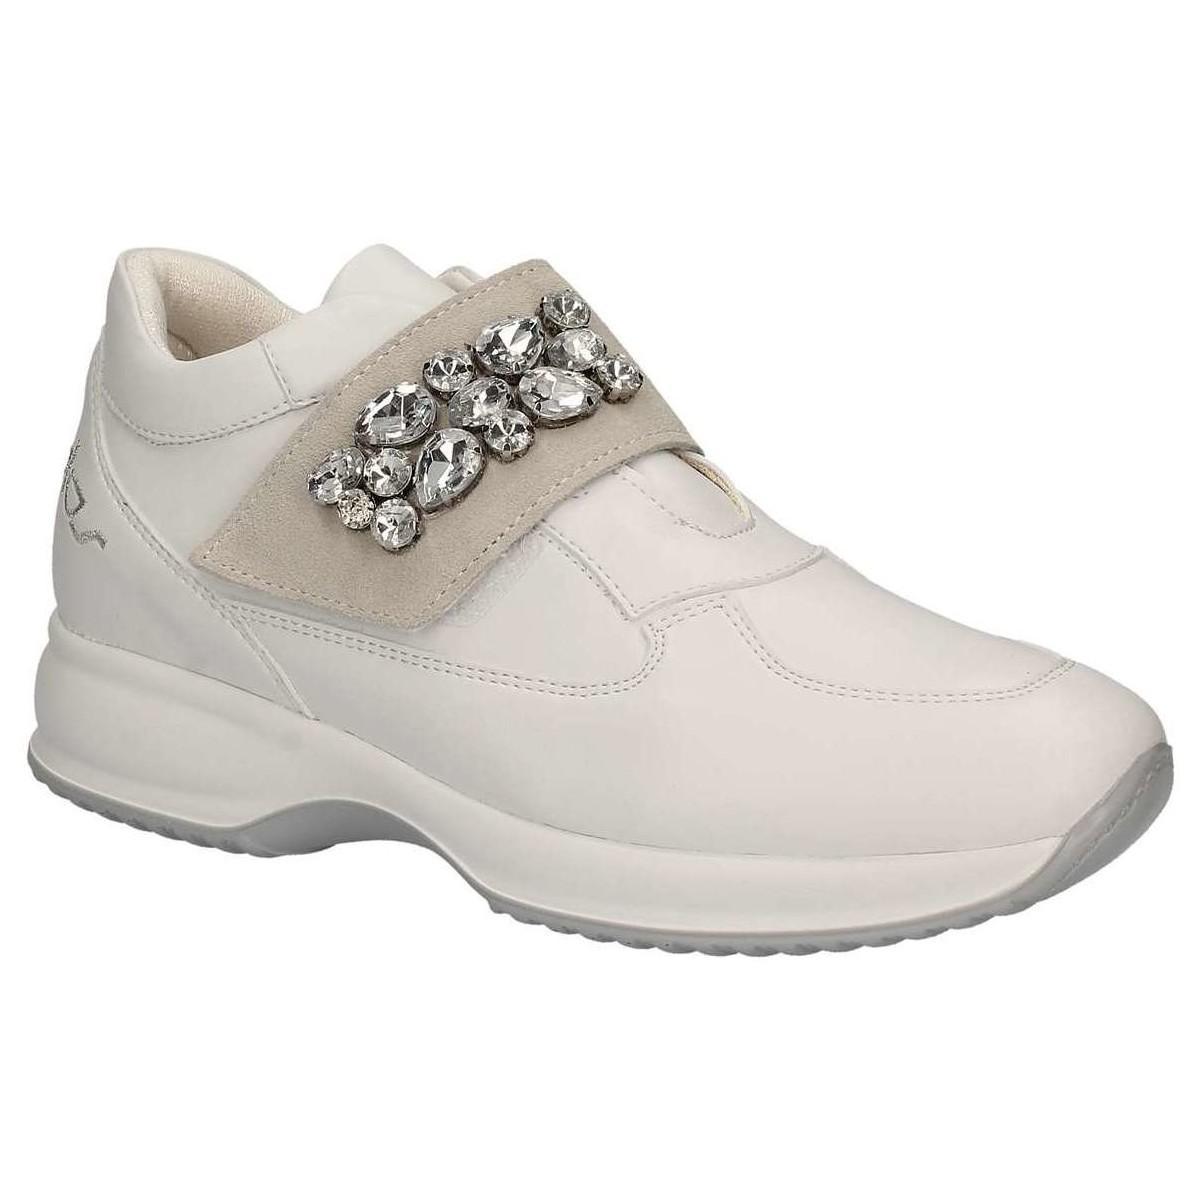 Byblos 672011 Sneakers Women women's Shoes (Trainers) in Deals Sale Online Cheap Sale Nicekicks From China y3u53